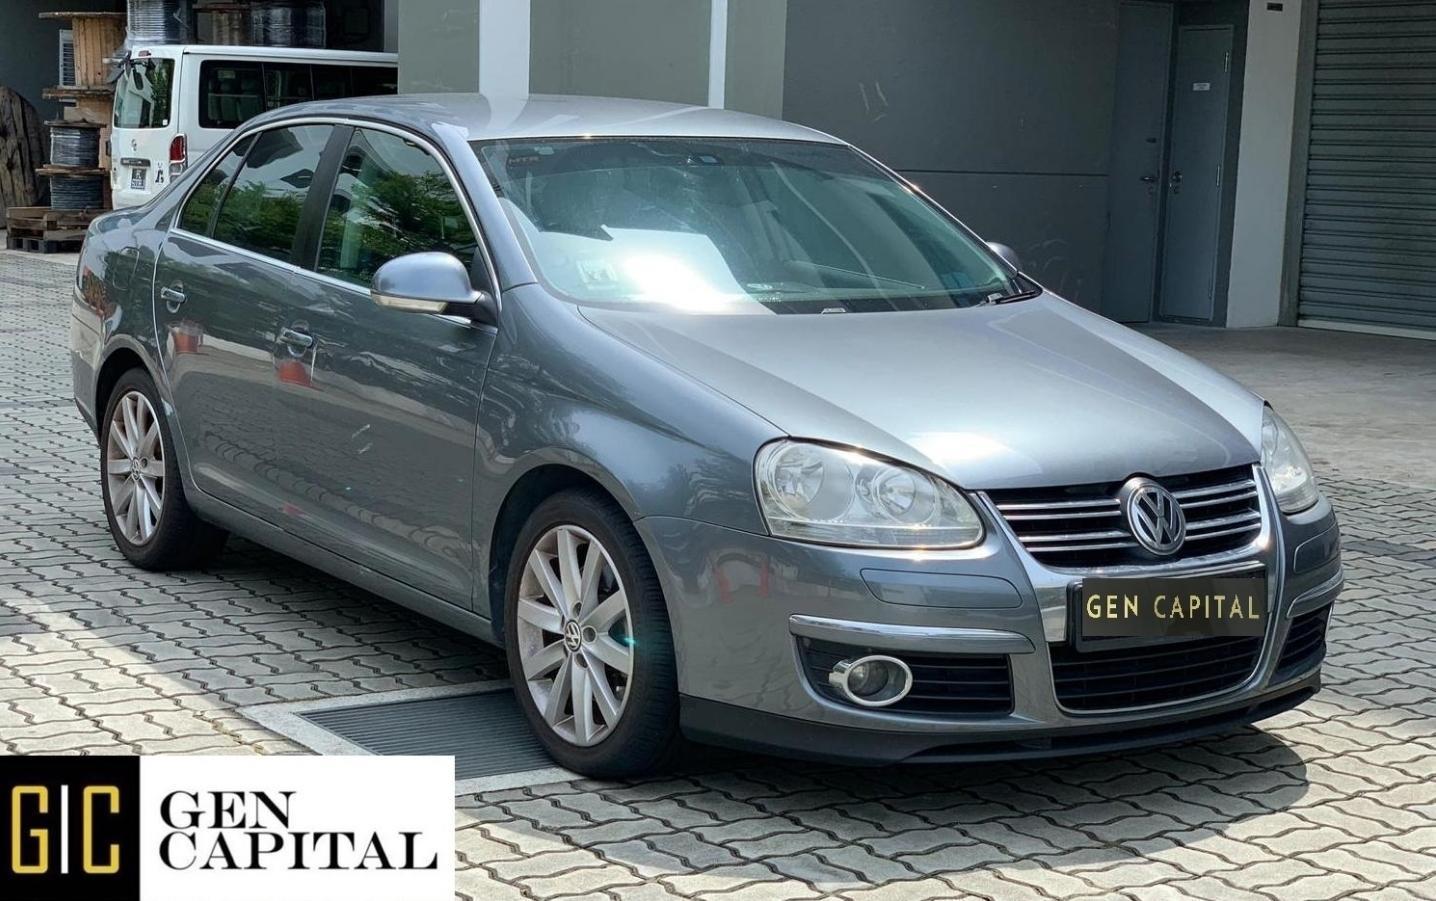 Volkswagen Jetta * Lowest rental rates, good condition!